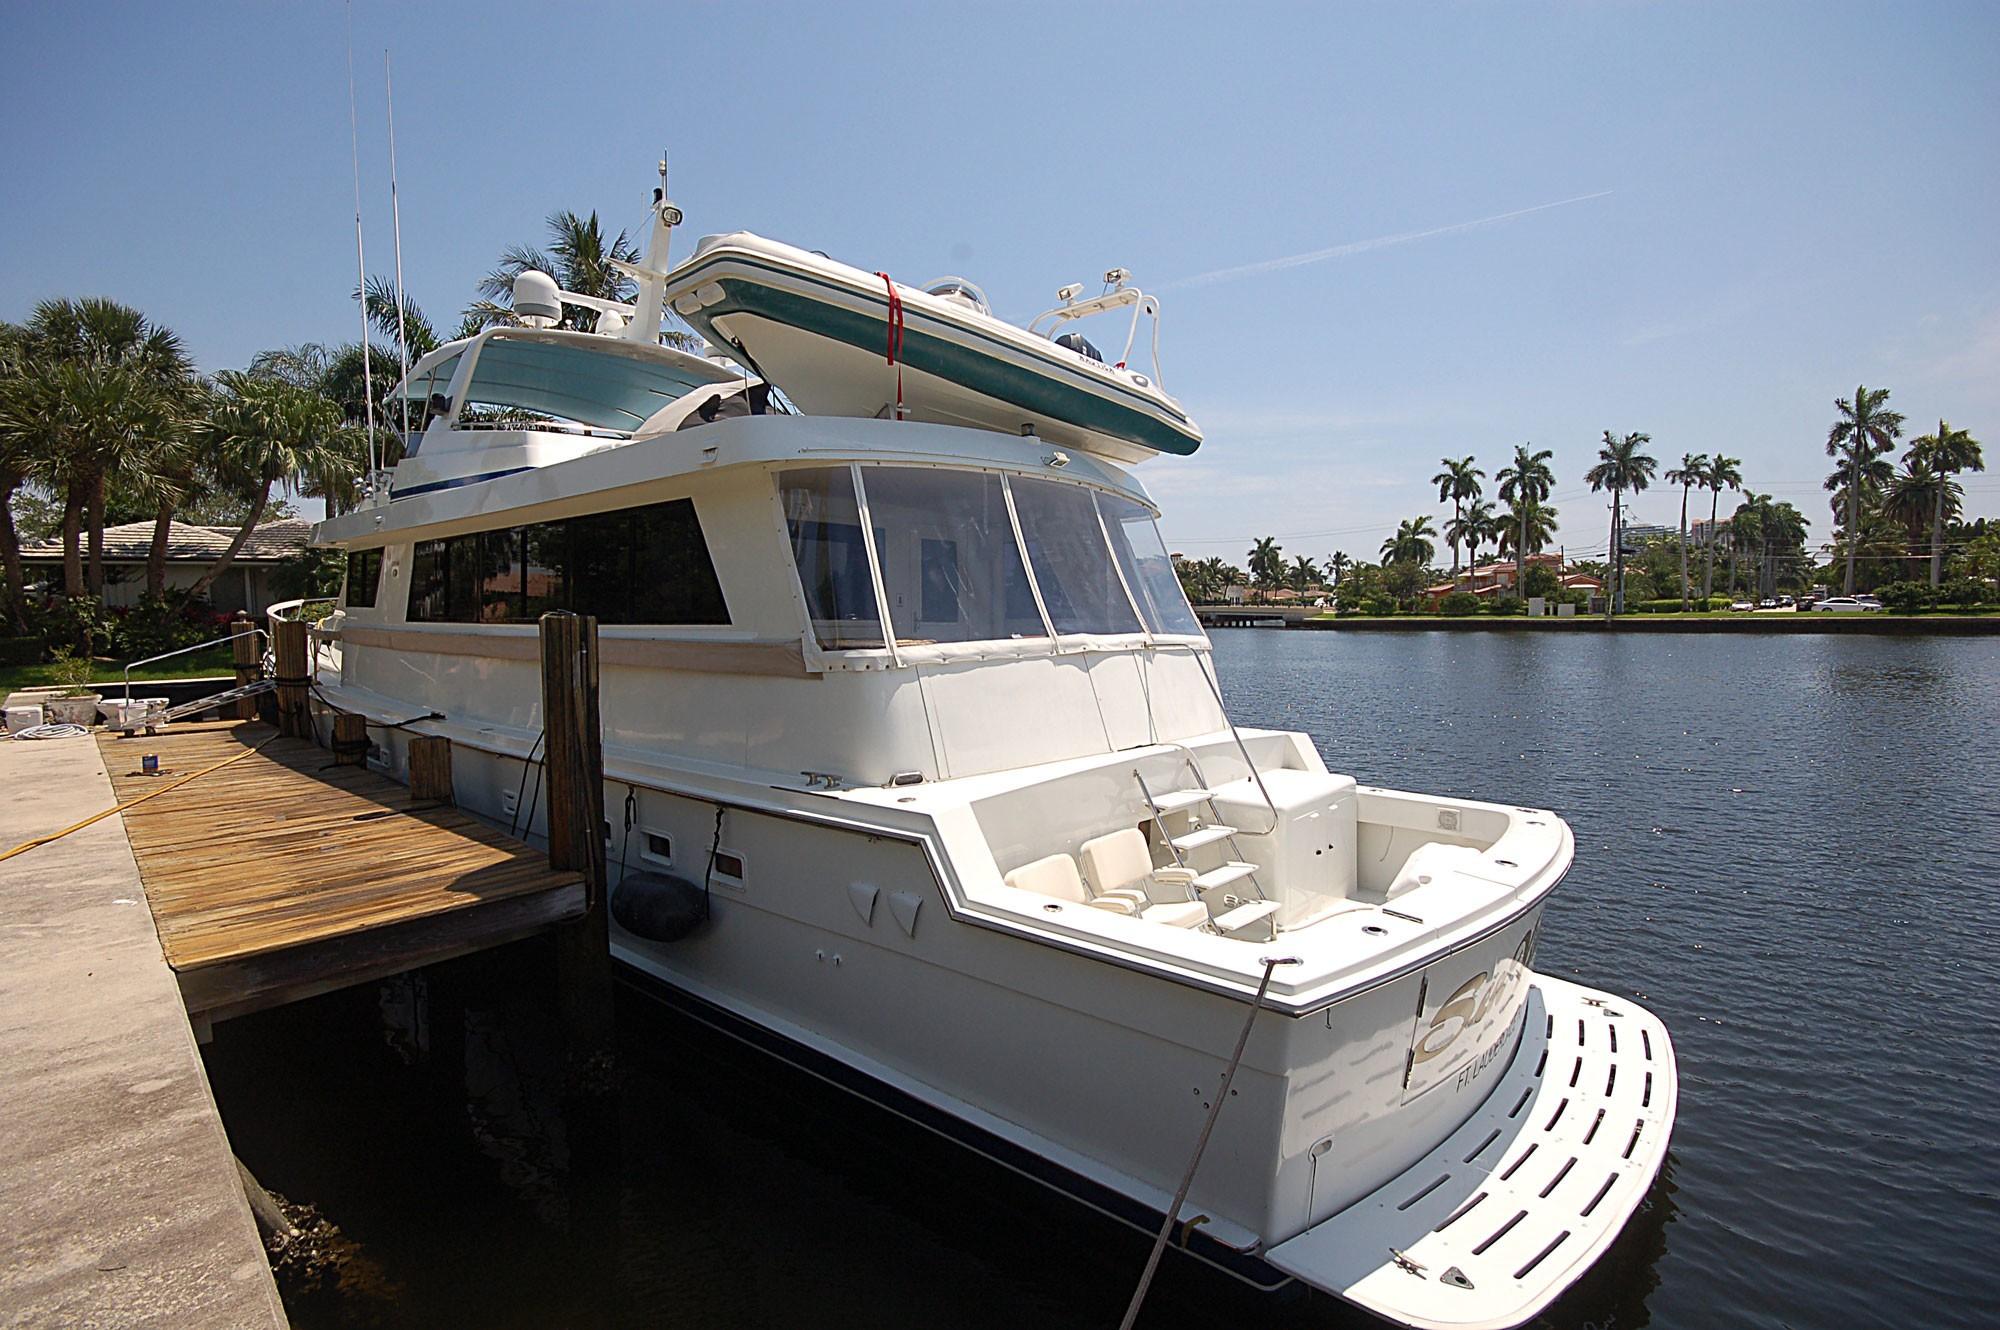 The 24m Yacht SEA VISTA